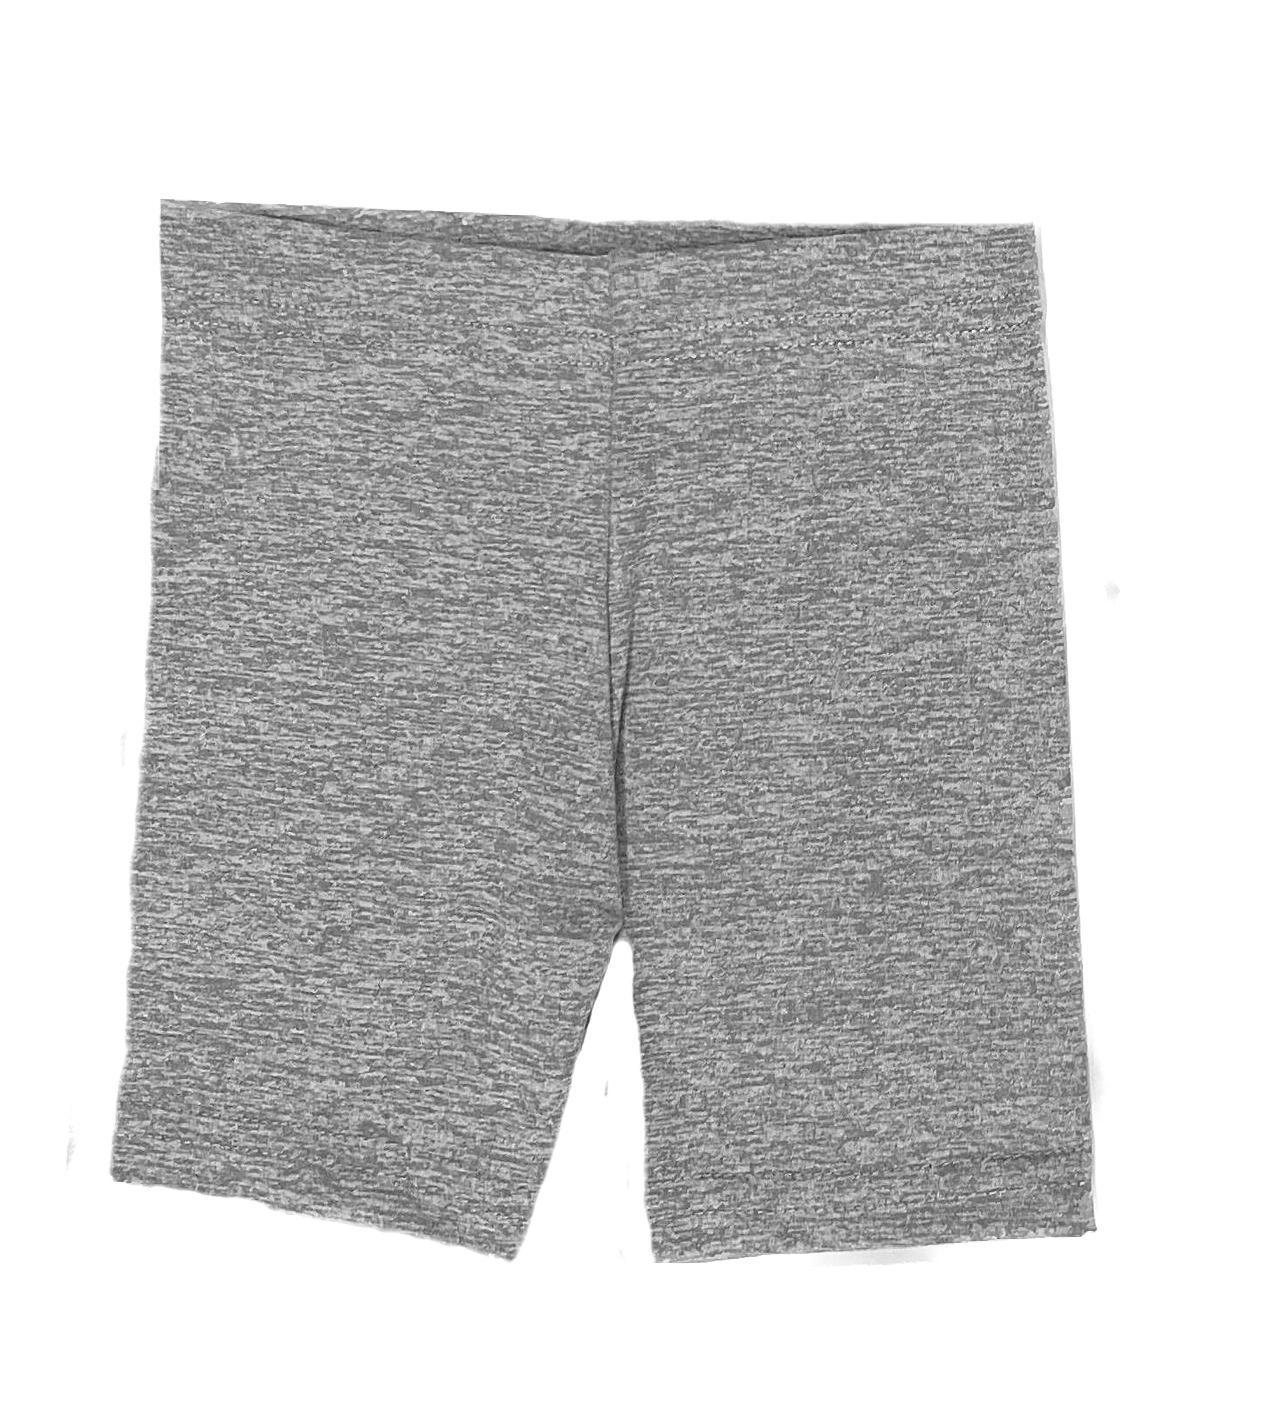 Dori Creations Grey/White Heathered Bike Shorts